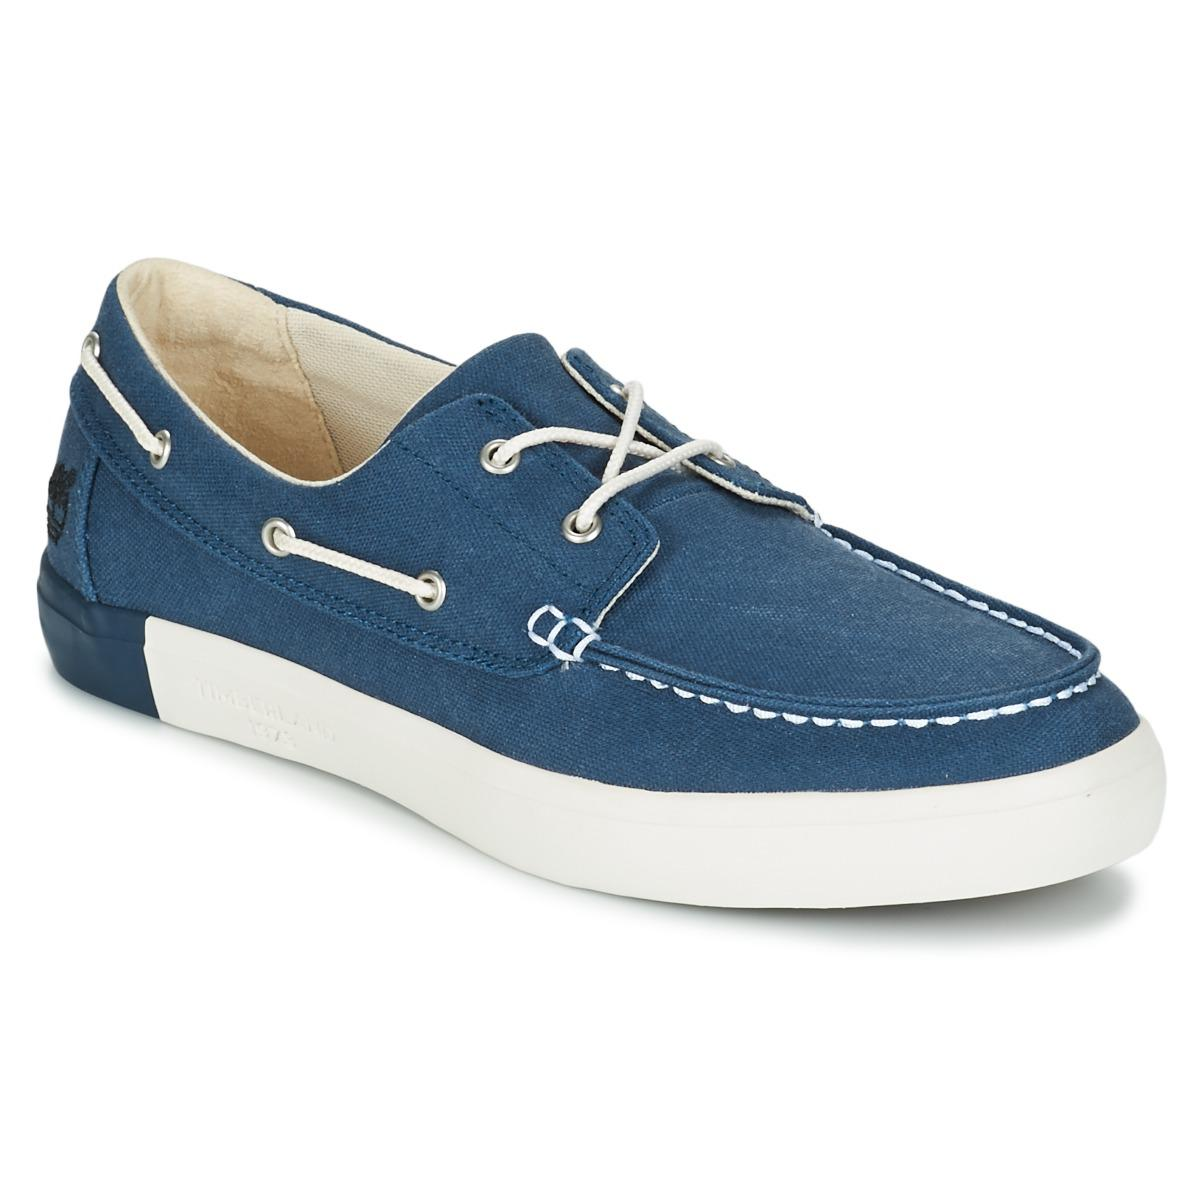 Timberland Newport Bay 2 Eye Boat Ox Men's Boat Shoes In